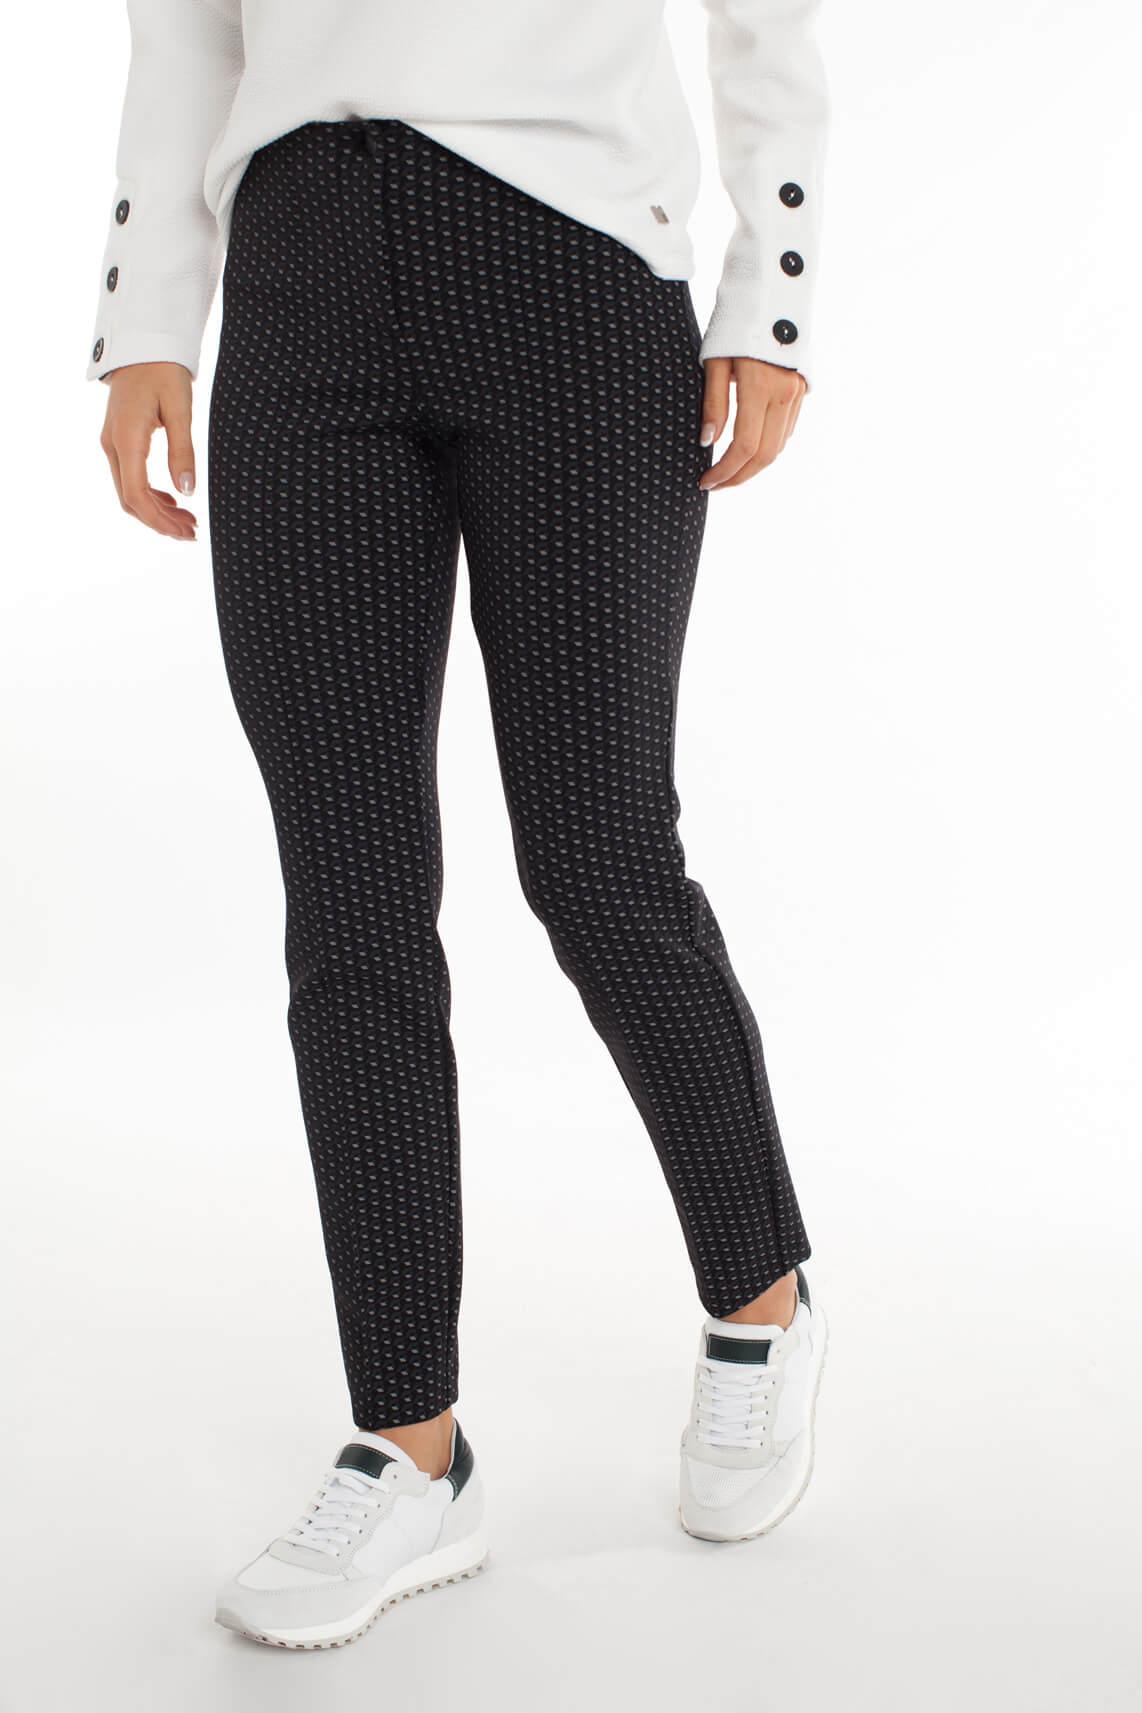 Cambio Dames Ros pantalon met grafische print zwart